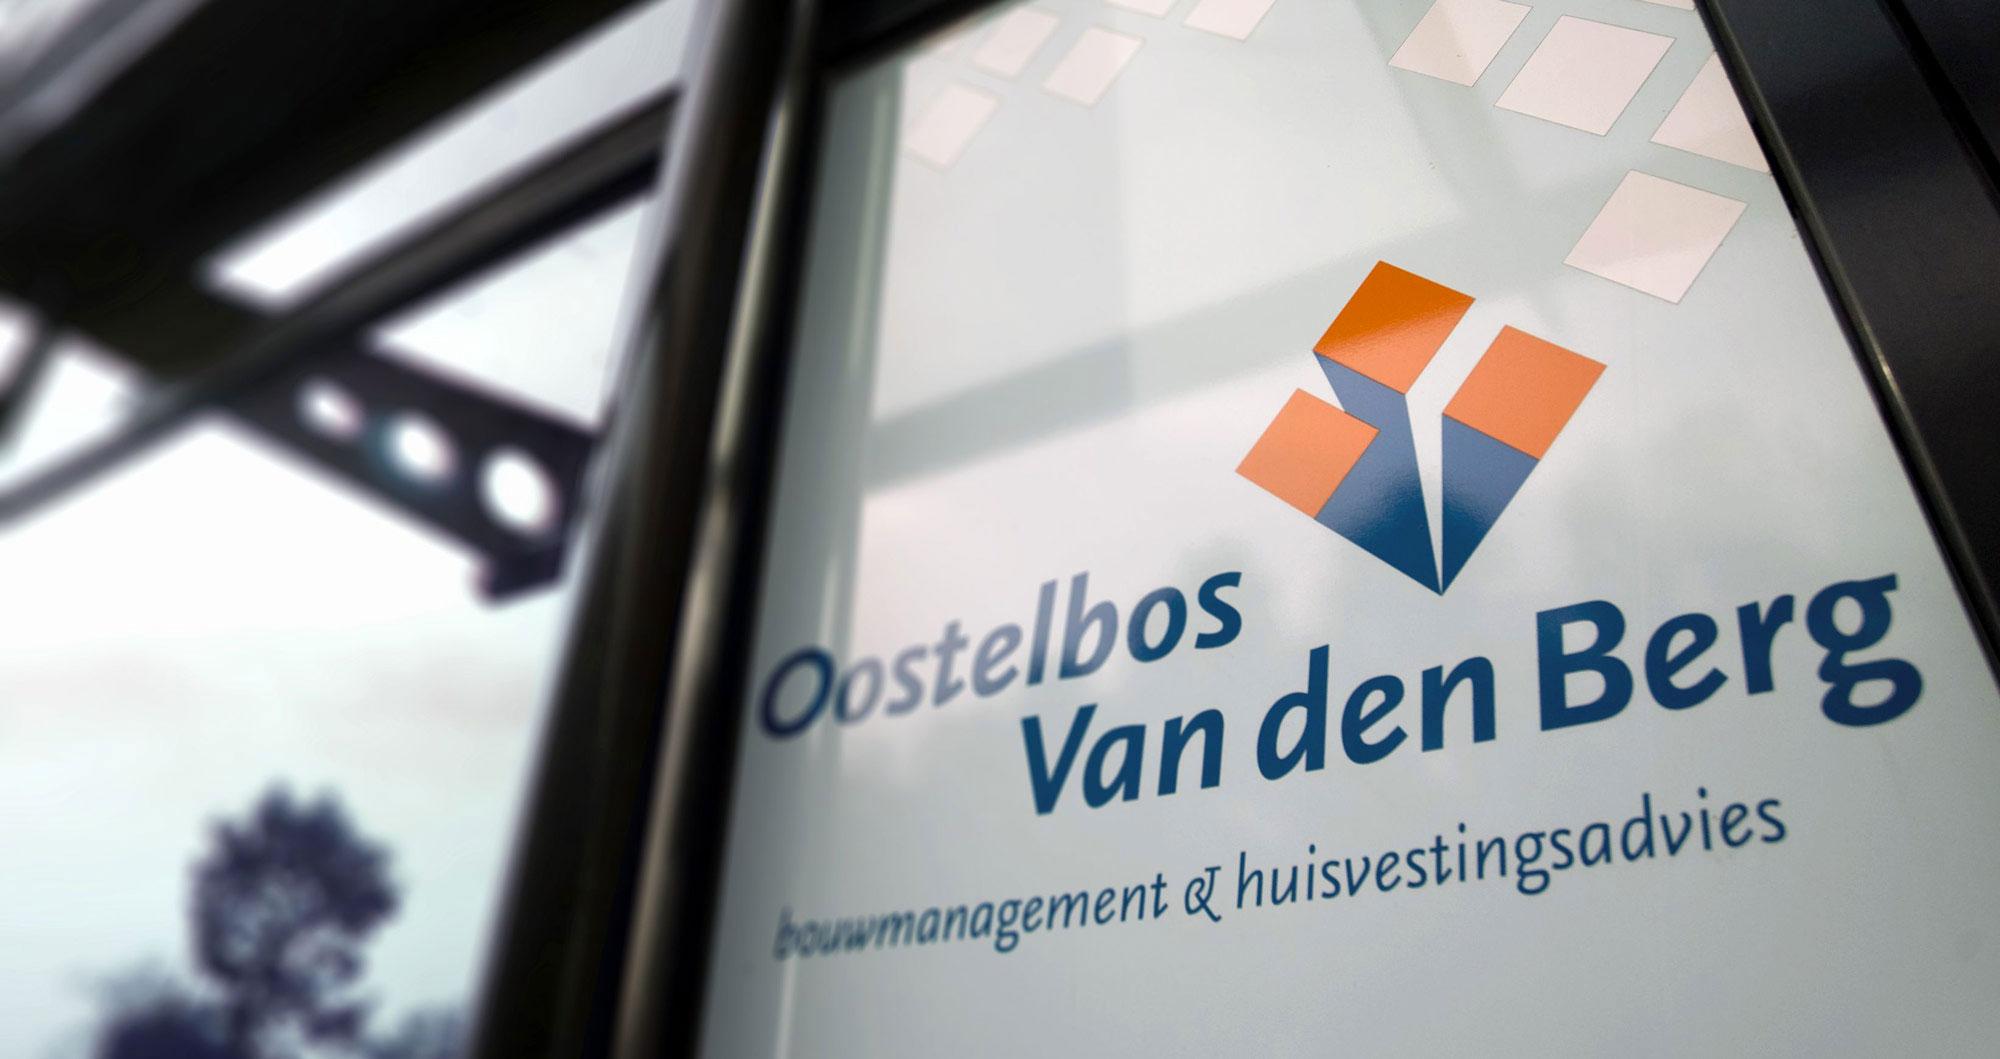 oostelbos-van-den-berg-bouwadviesbureau